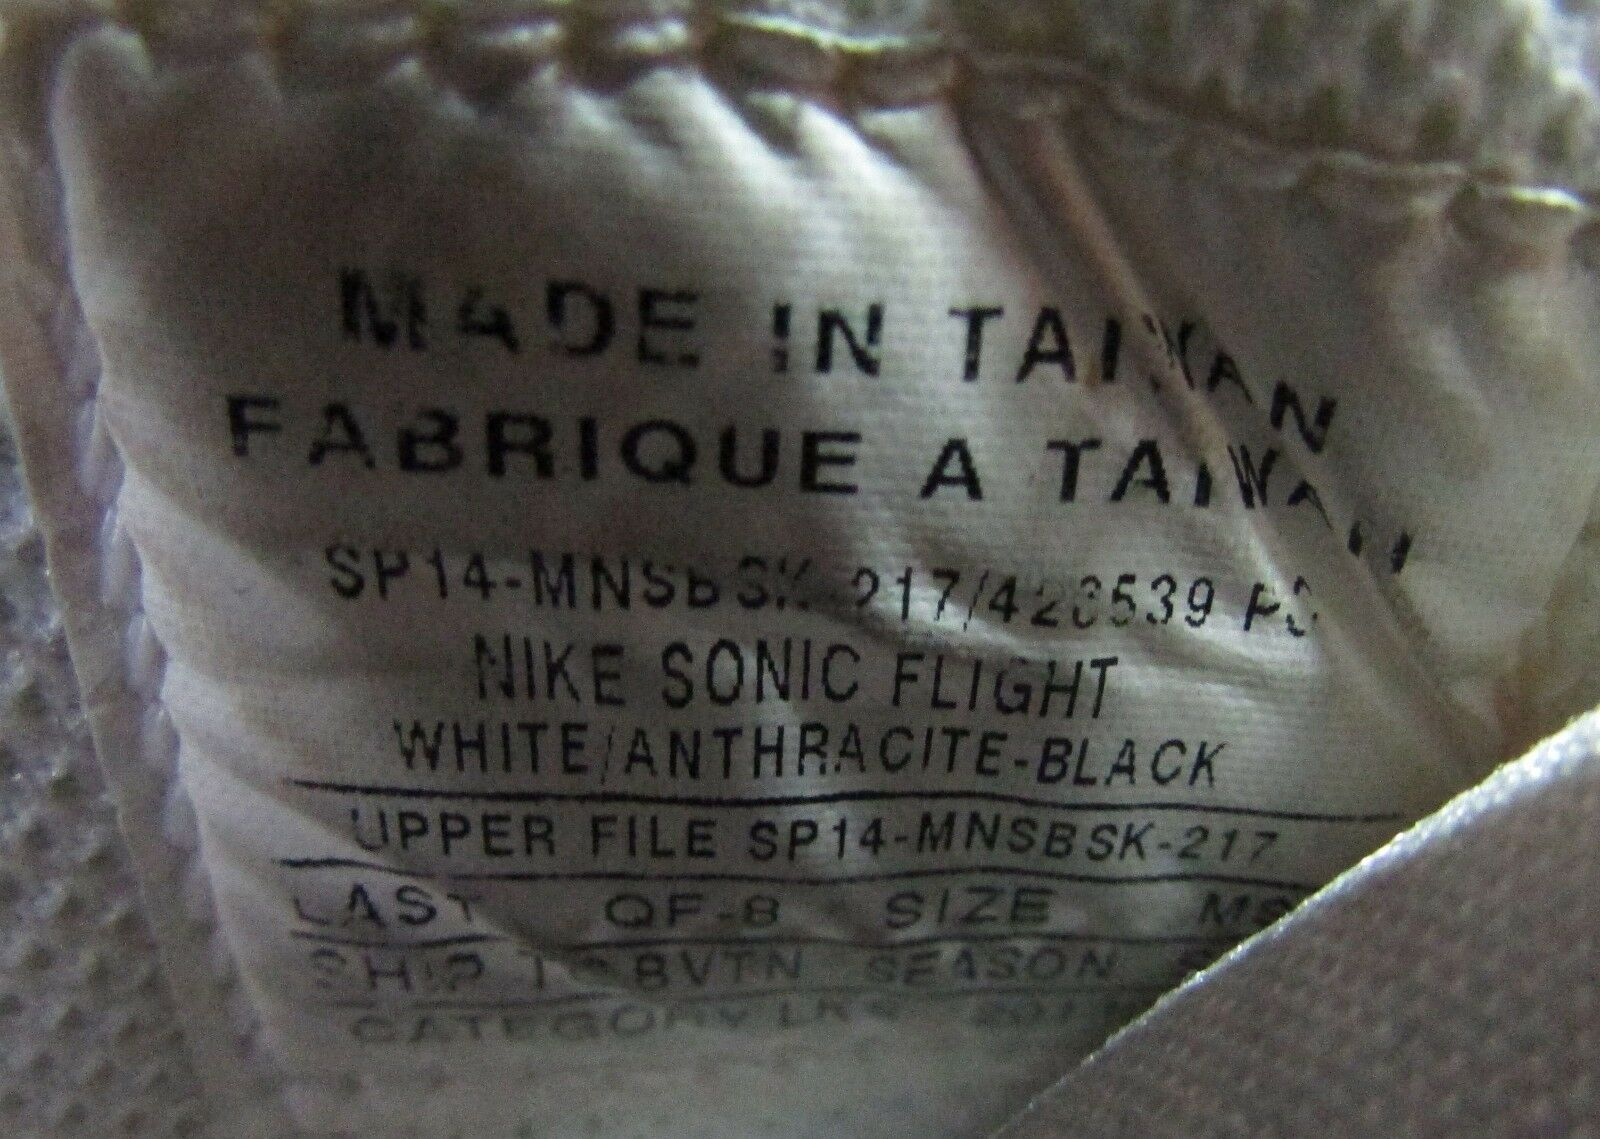 Nike  Sonic Flight Gary Payton  Nike  Herren Basketball Schuhes Samples GP20 Größe 9 a31710